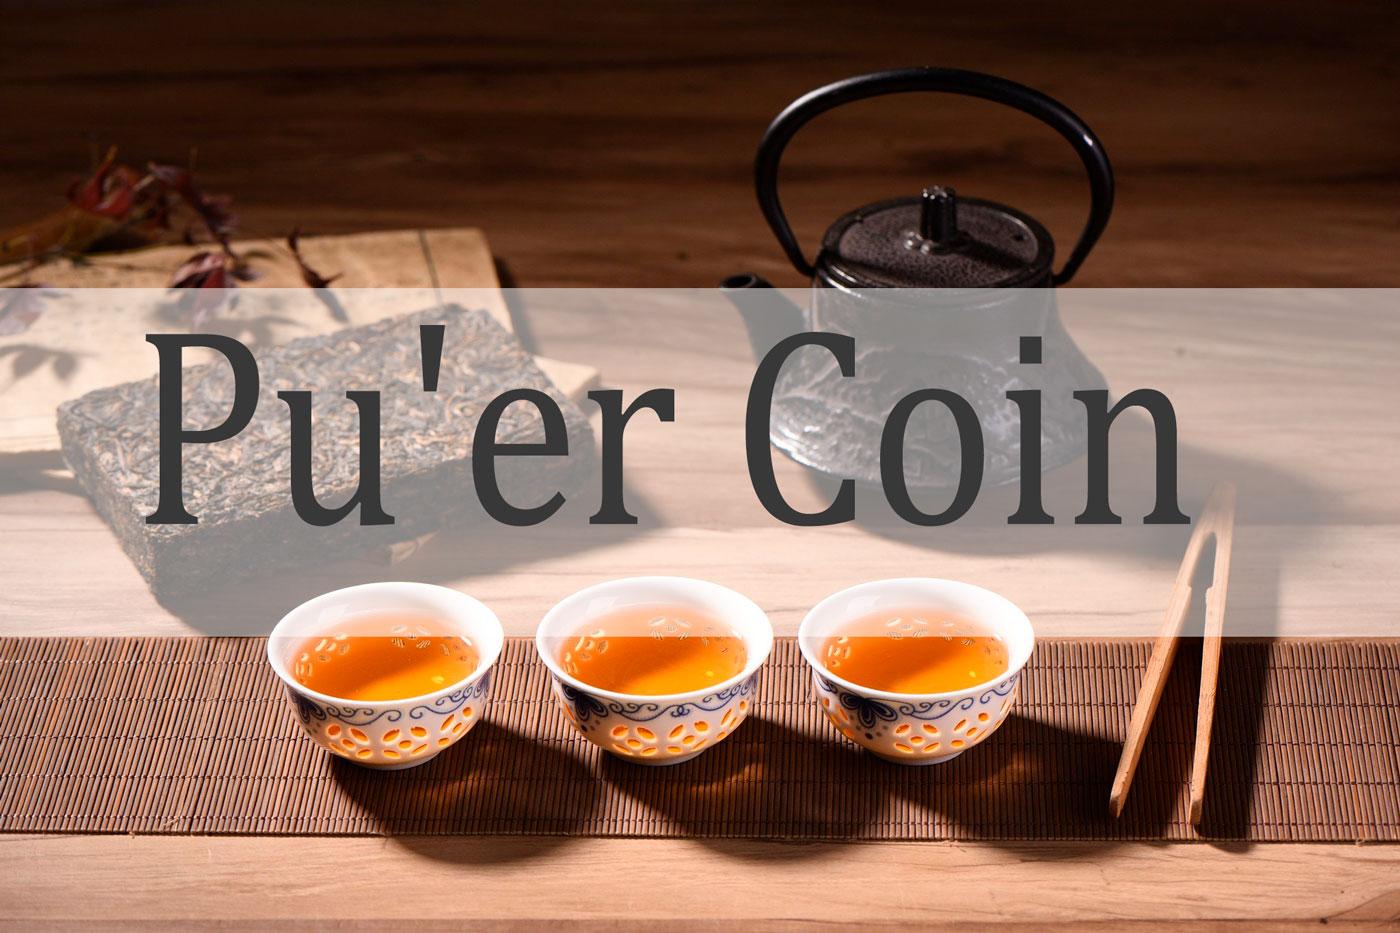 Pu'er Coin